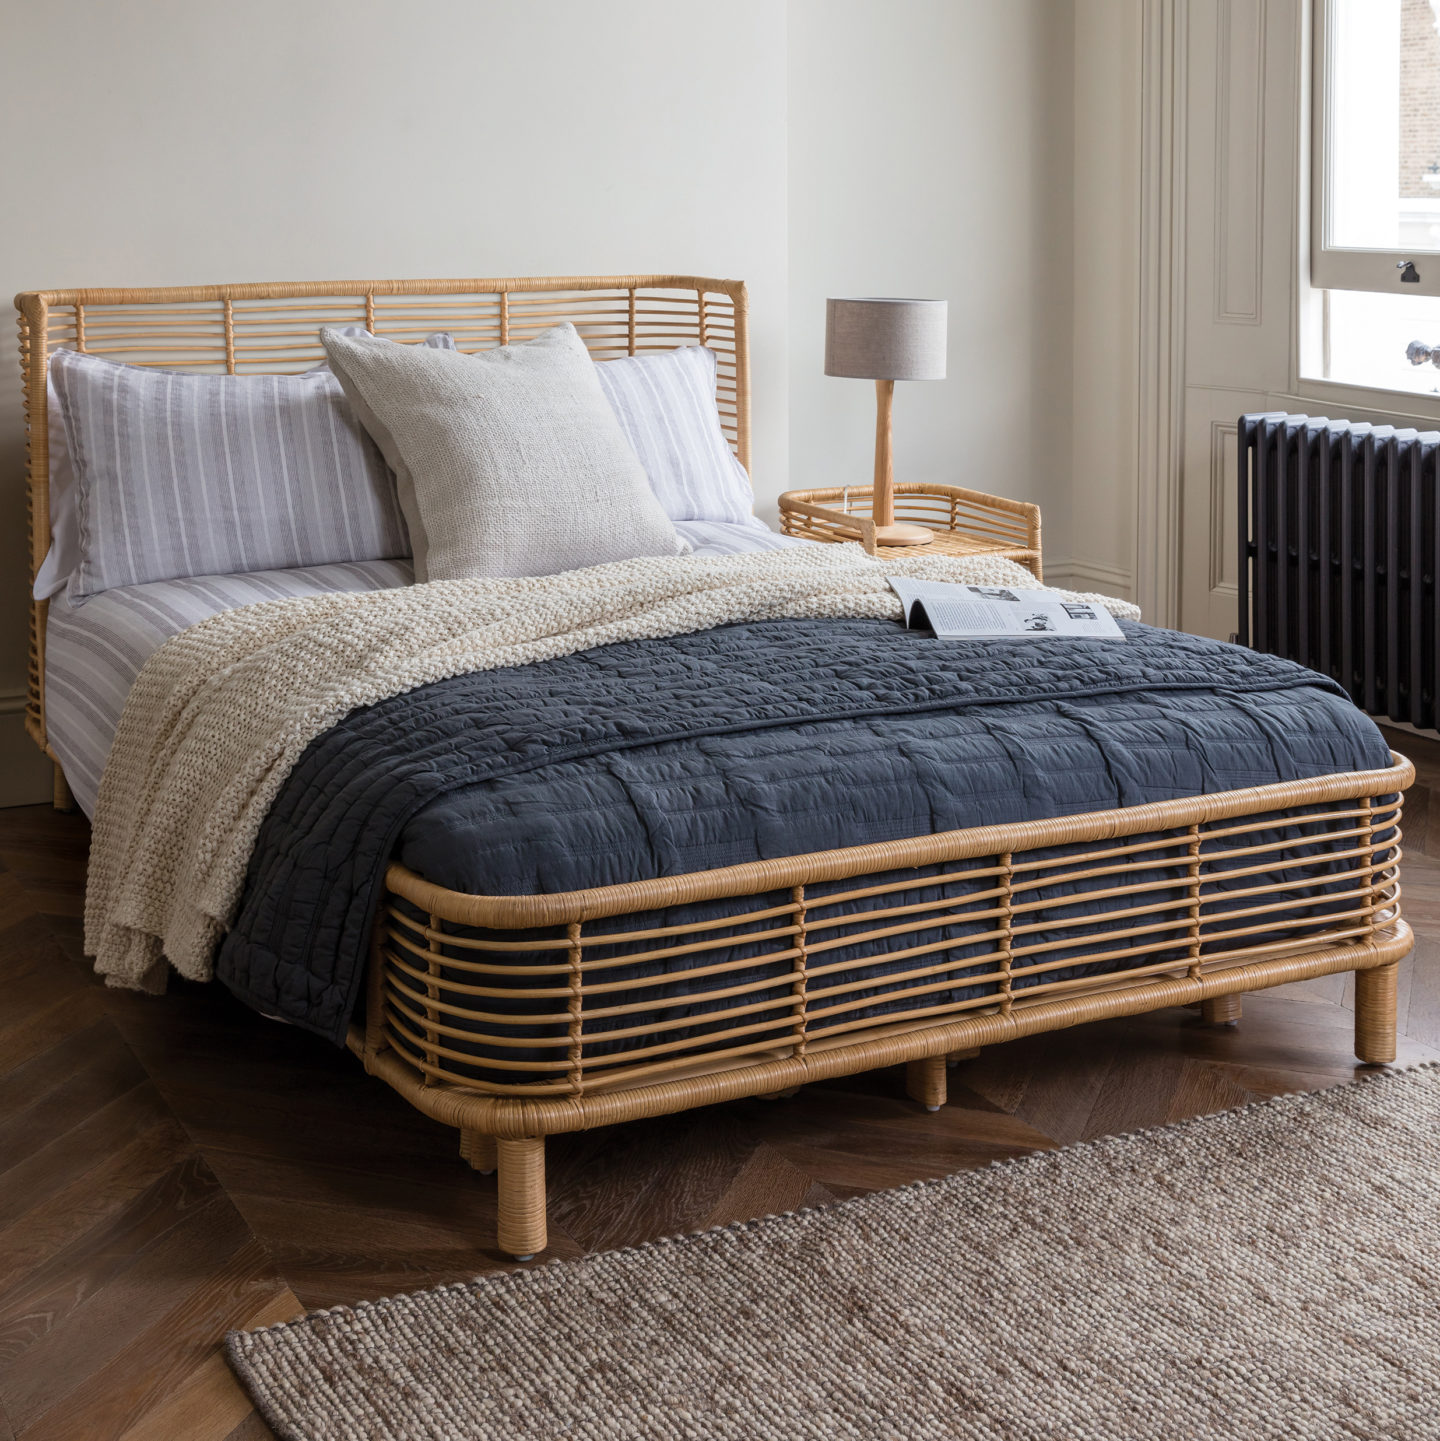 Rattan, Interior trend, Interiors, Decor, Rattan Bed